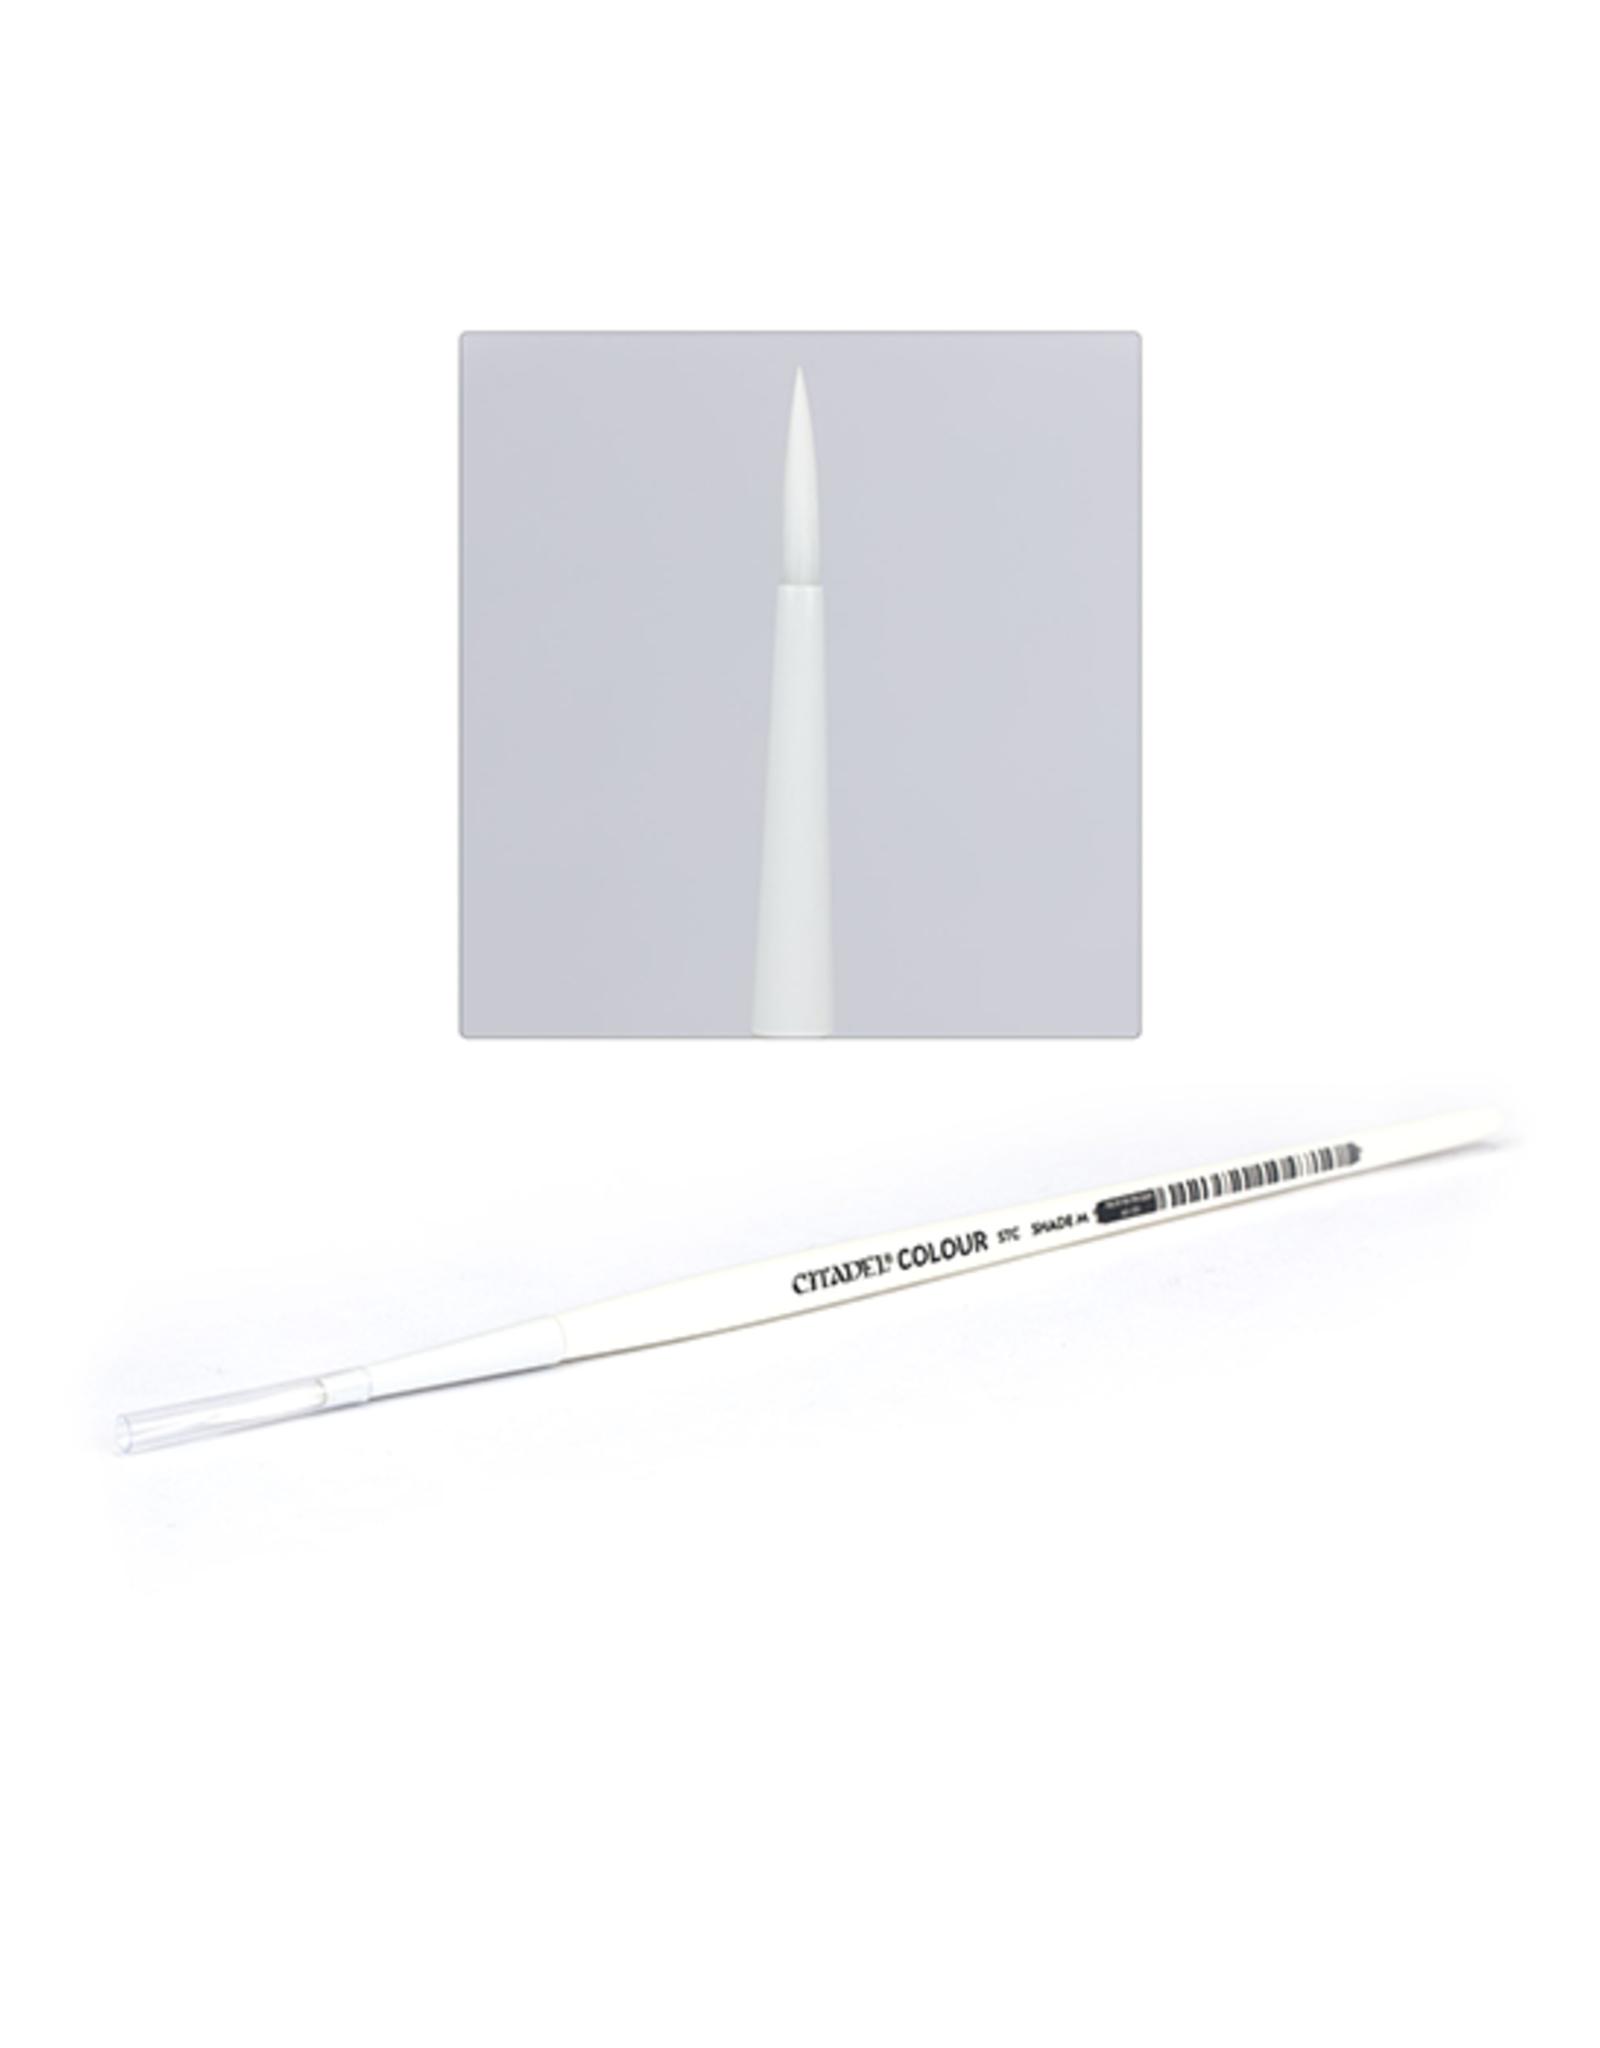 Citadel Citadel: Paint Brush - Synthetic - Shade - Medium